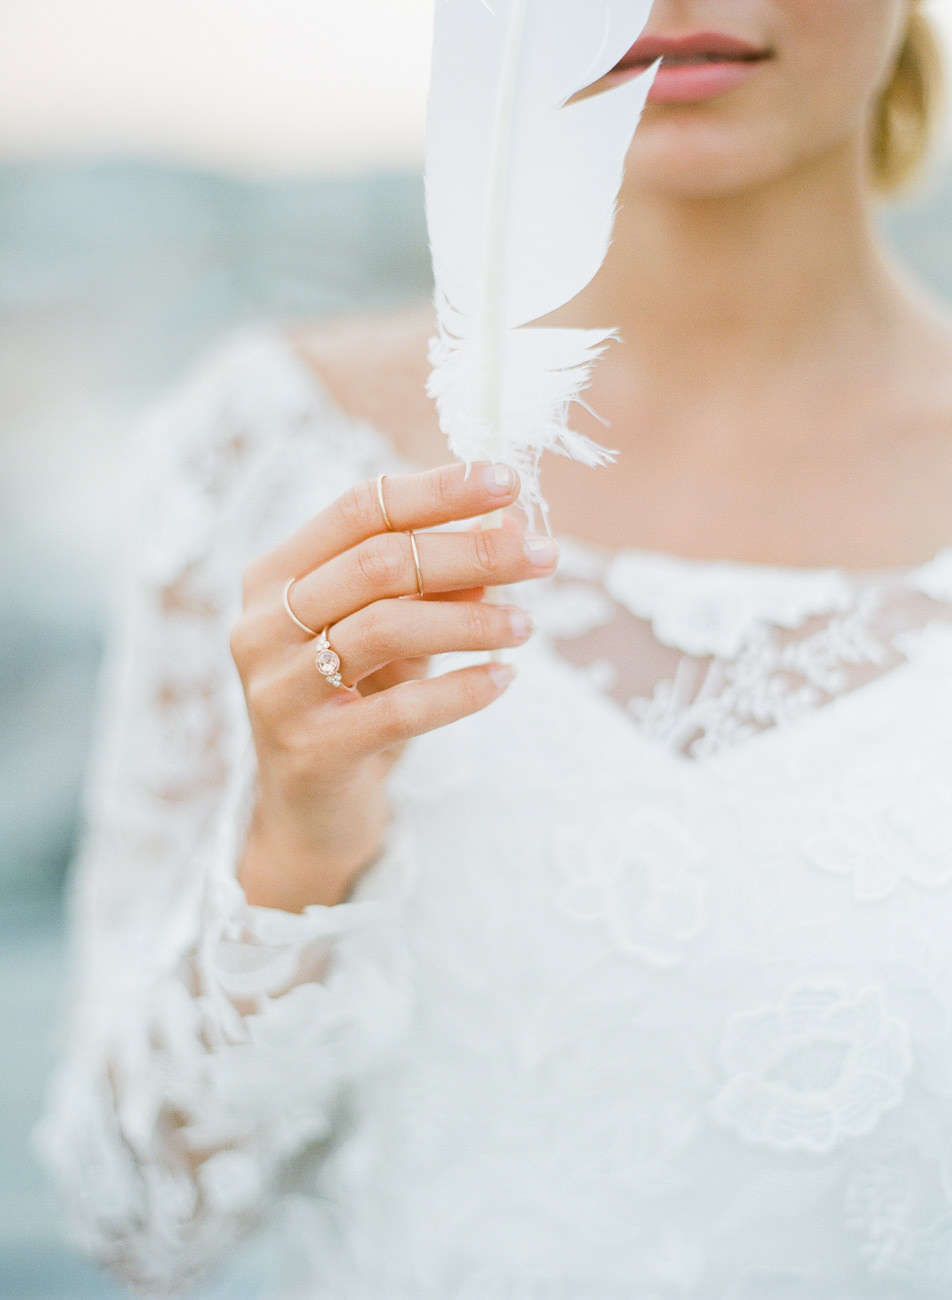 toits-paris-photographe-mariage-alain-m-12.jpg